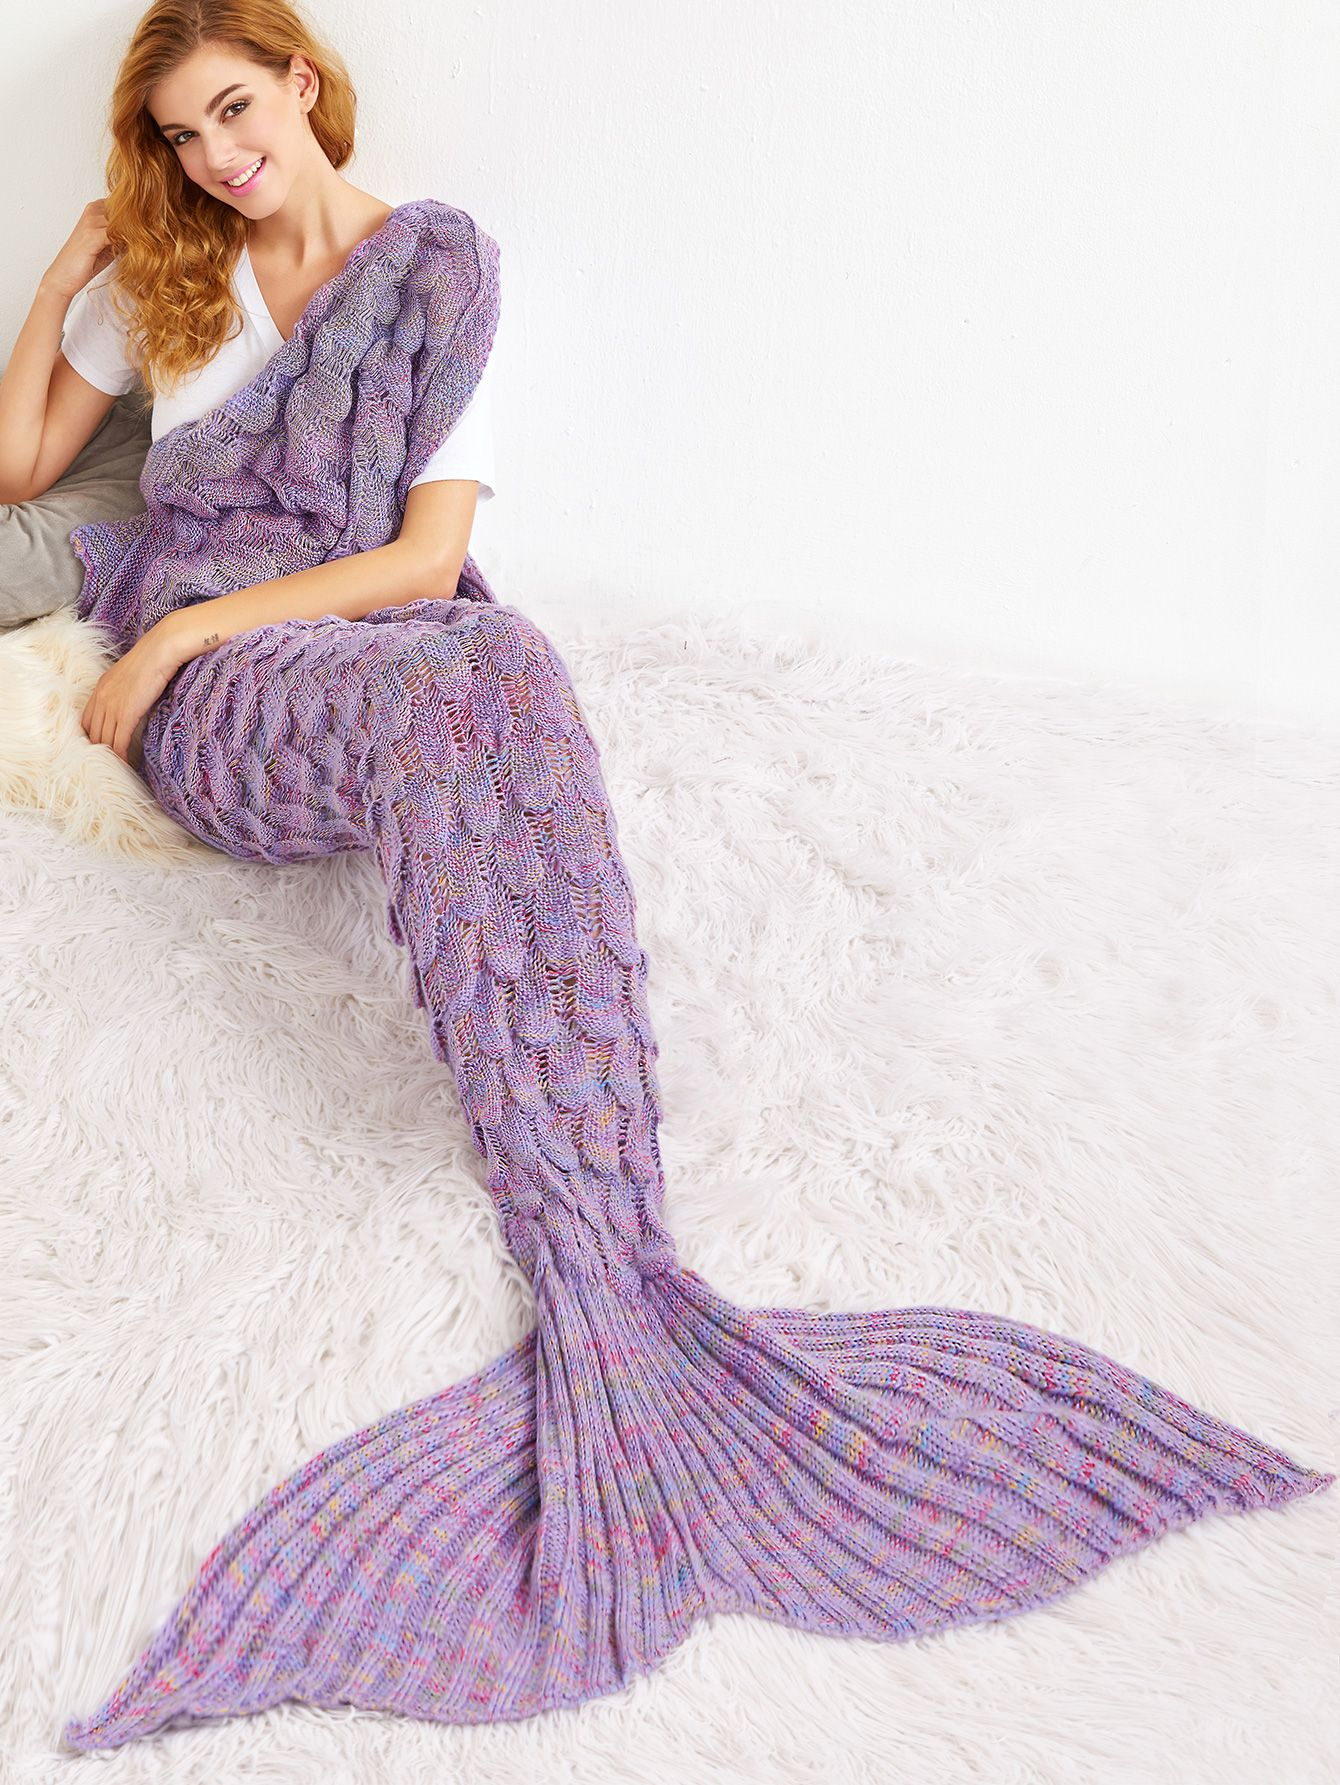 Dusty Purple Crocheted Fish Scale Design Mermaid Blanket | Wishlist ...